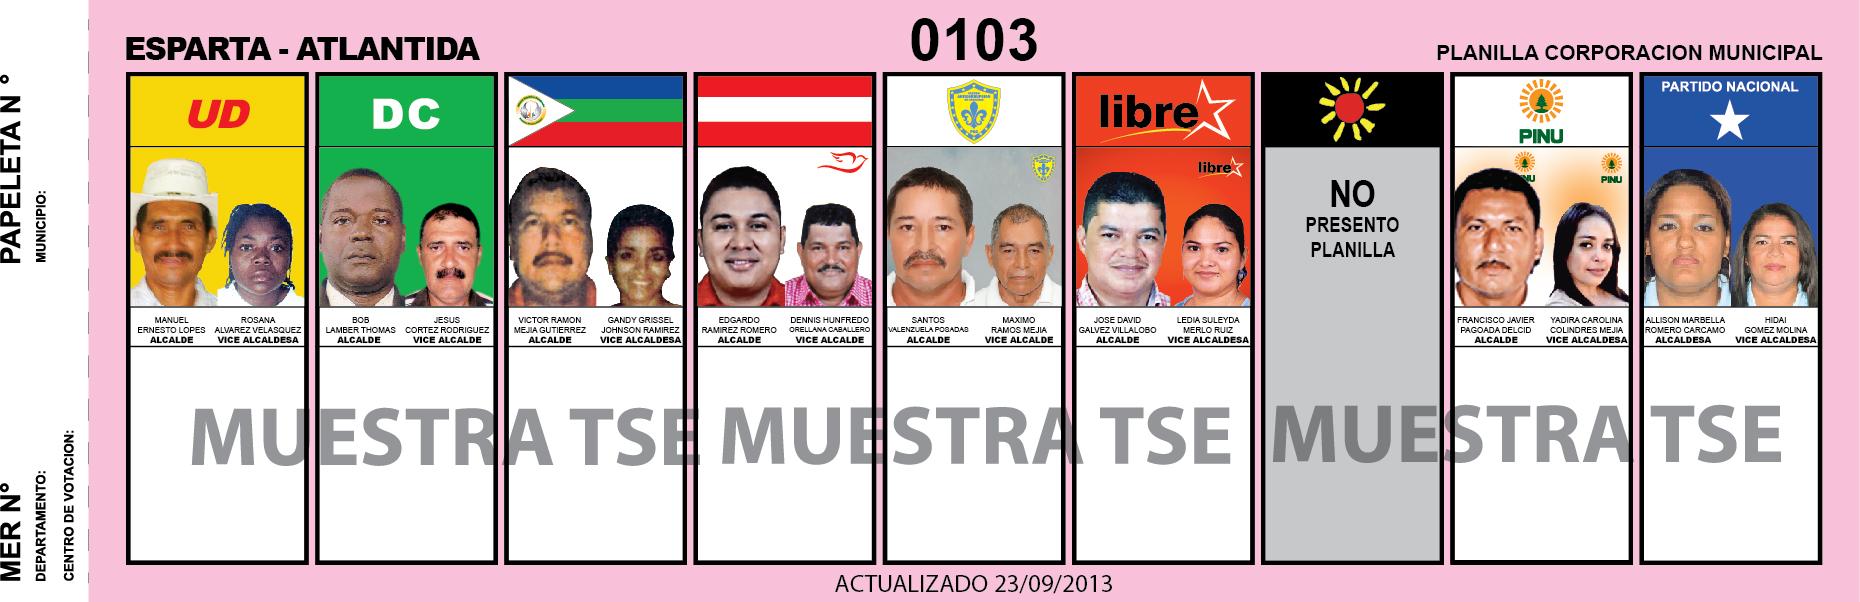 CANDIDATOS 2013 MUNICIPIO ESPARTA - ATLANTIDA - HONDURAS